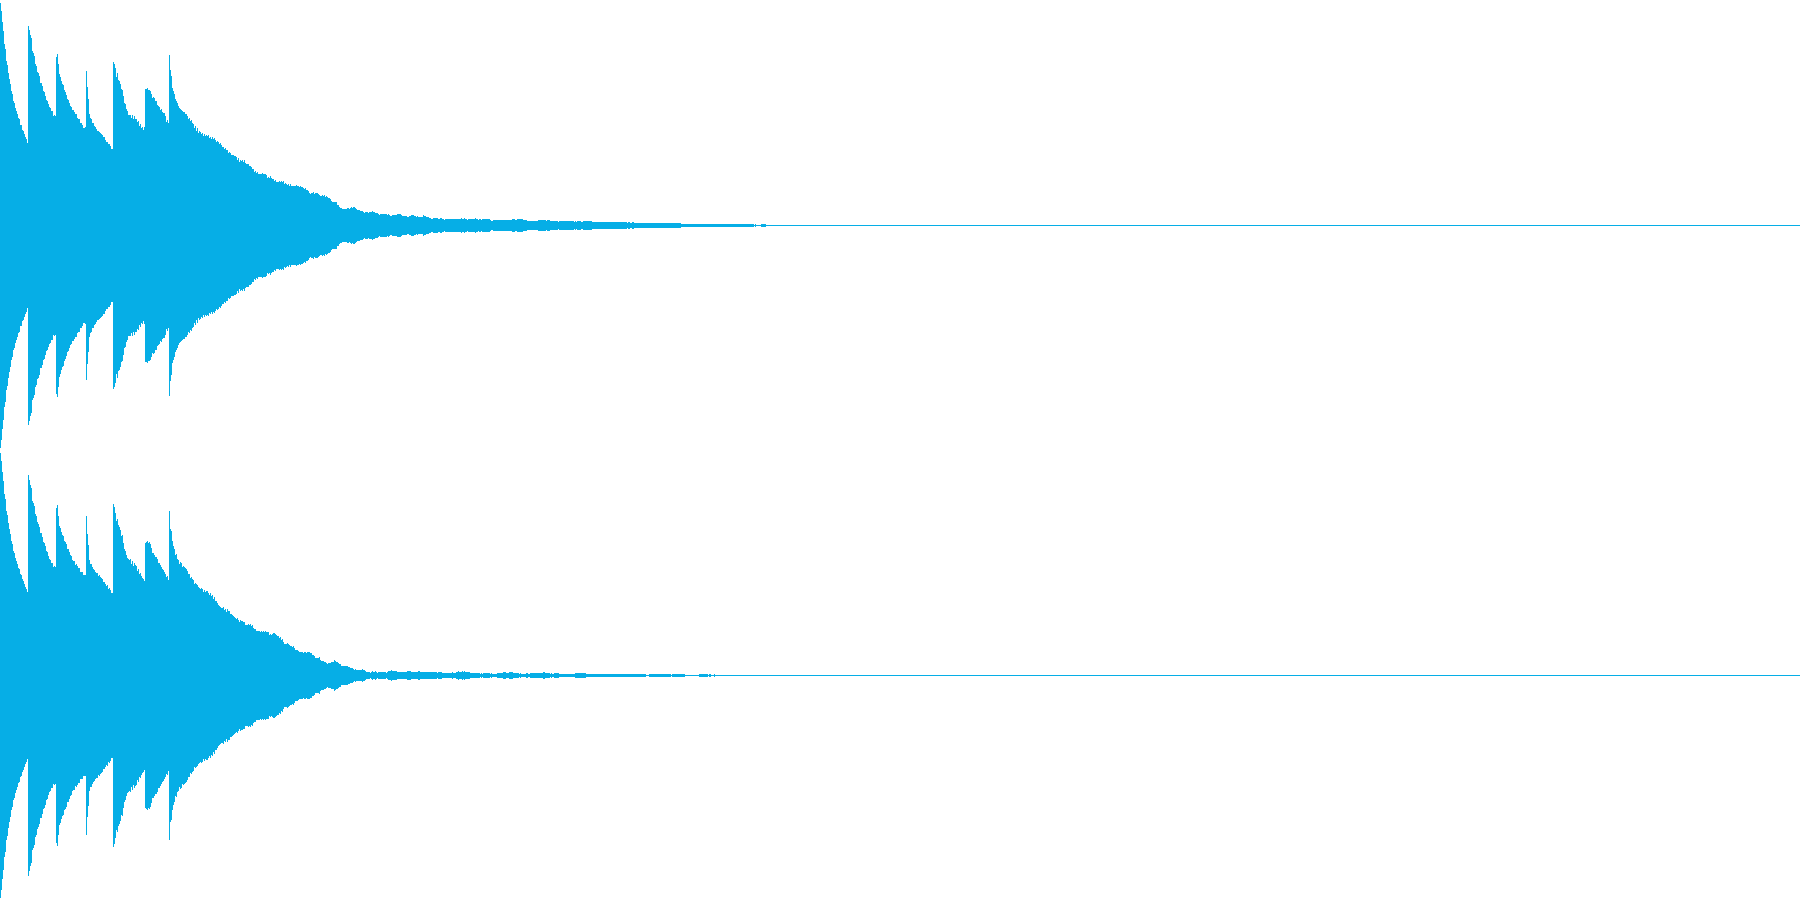 Bank 汎用性のある通知・認証音 22の再生済みの波形